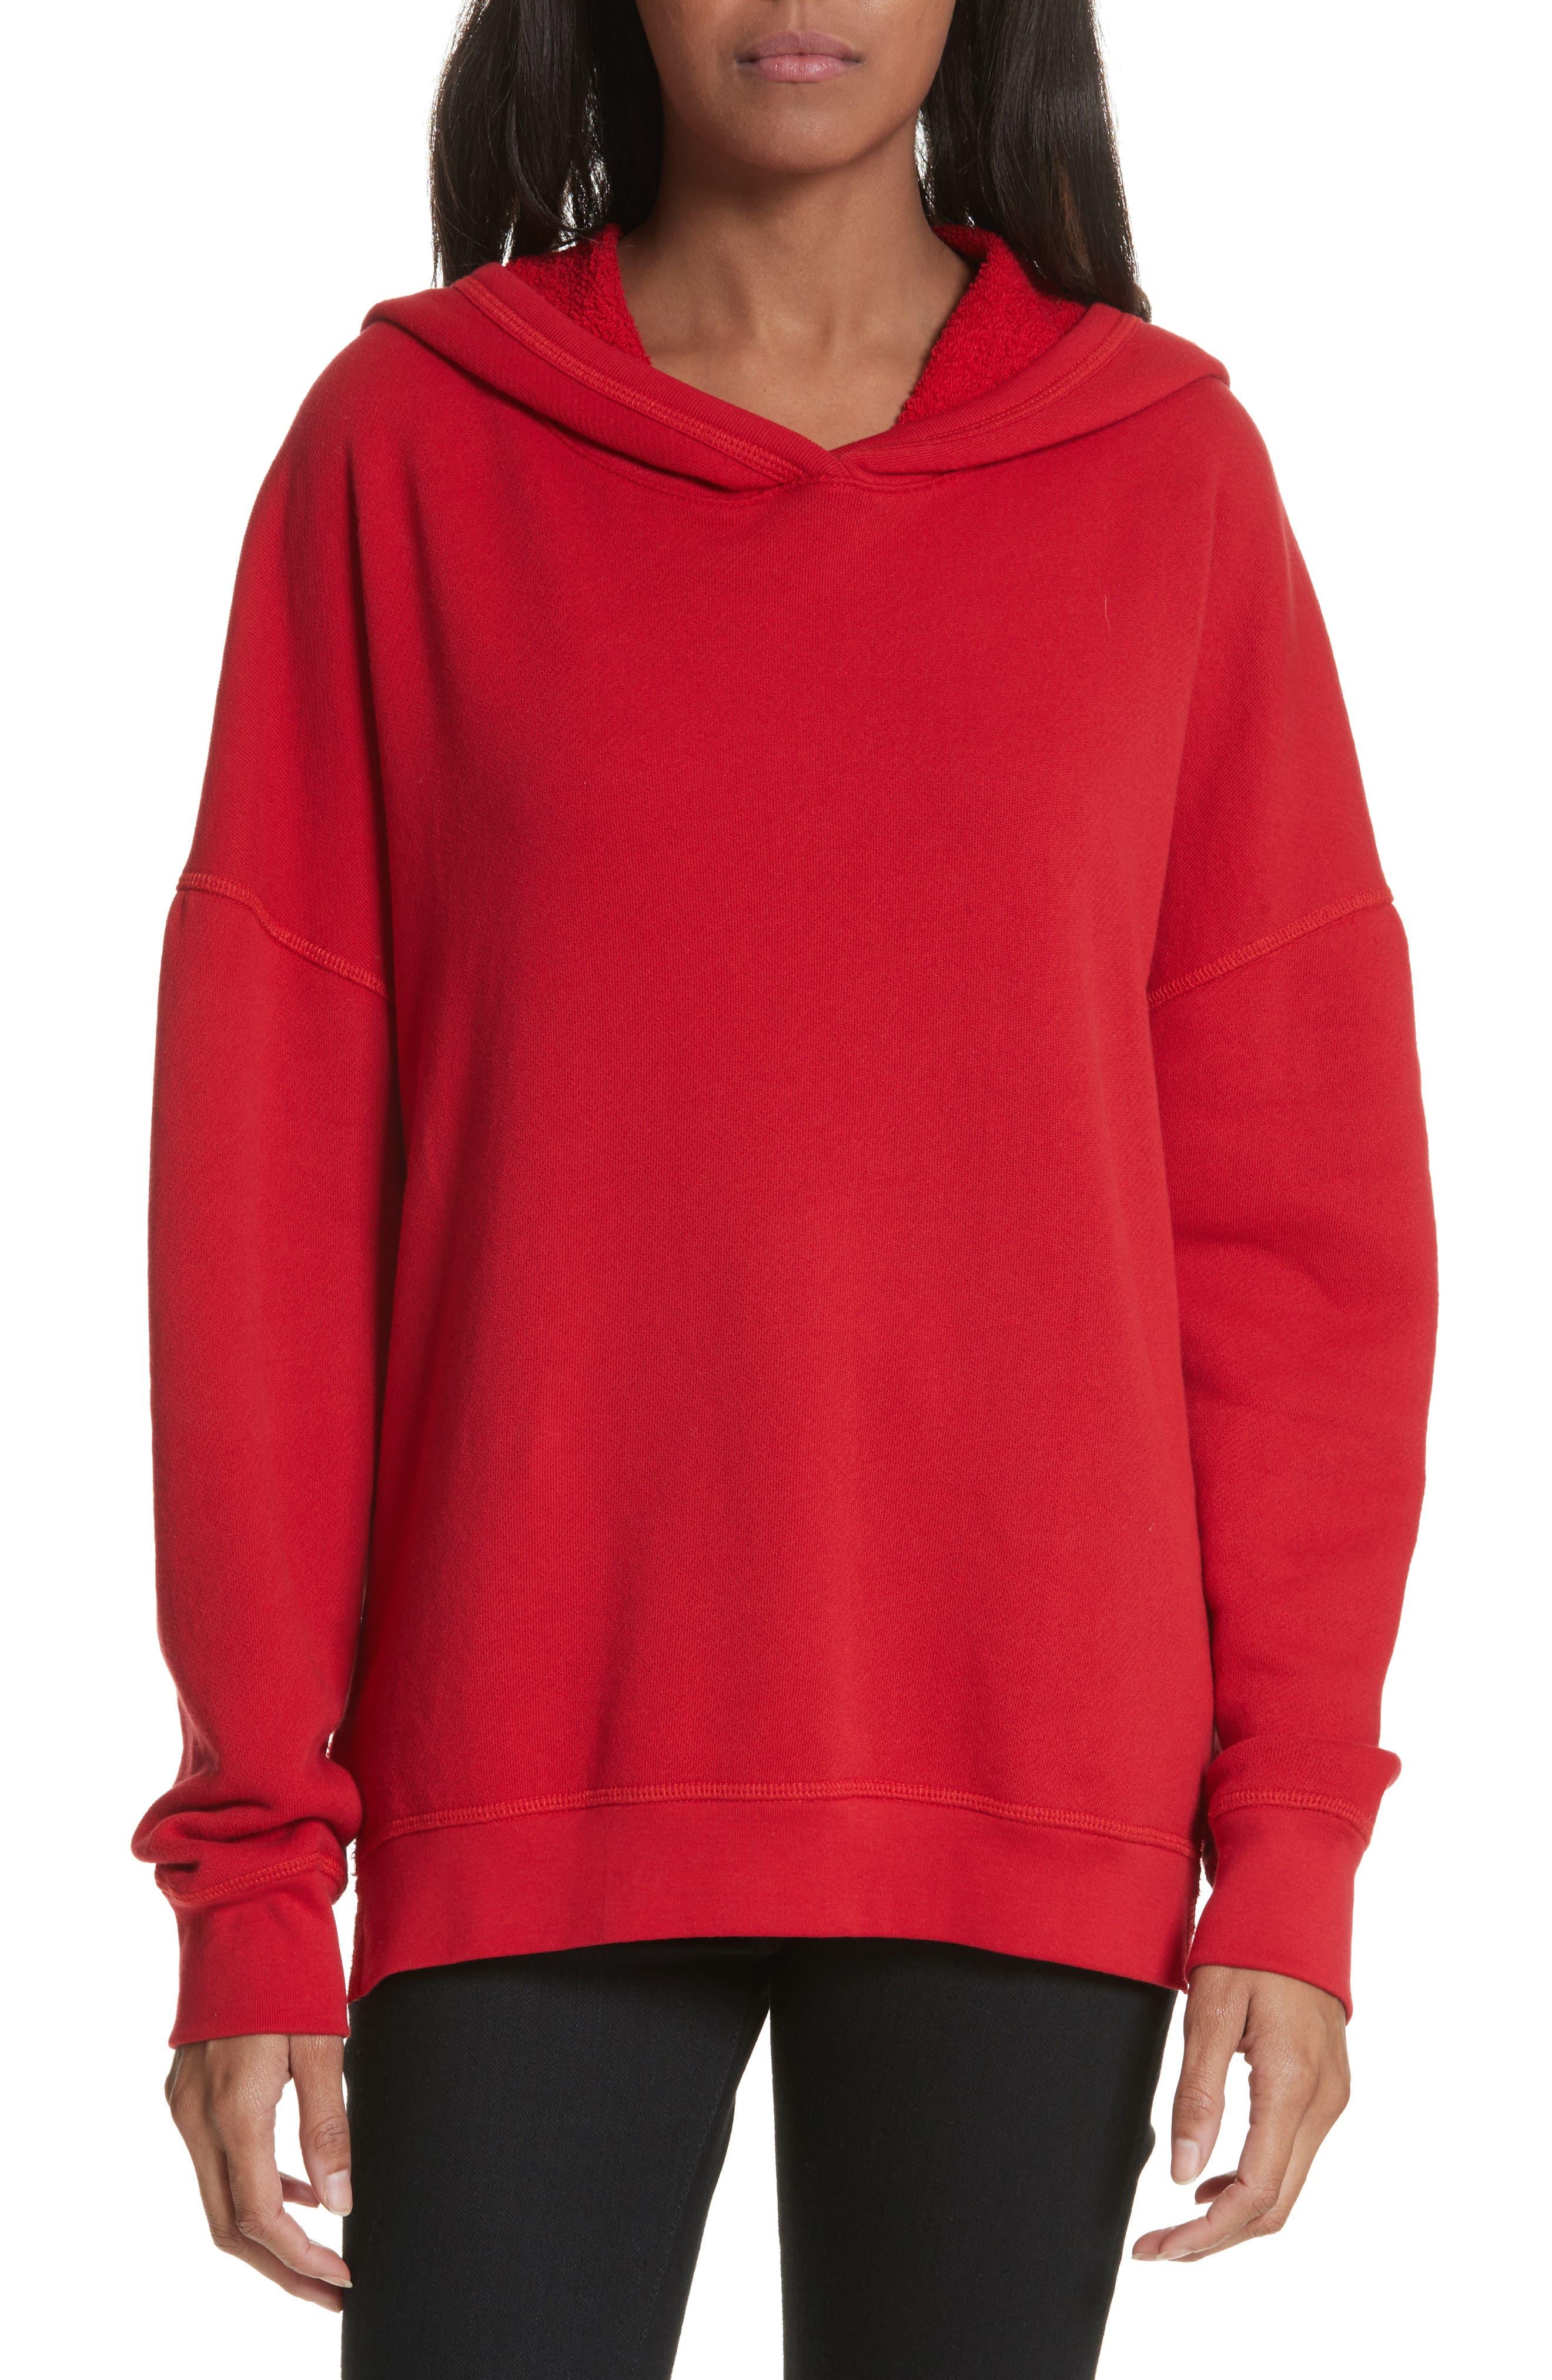 Adene Hooded Sweatshirt,                         Main,                         color, 600